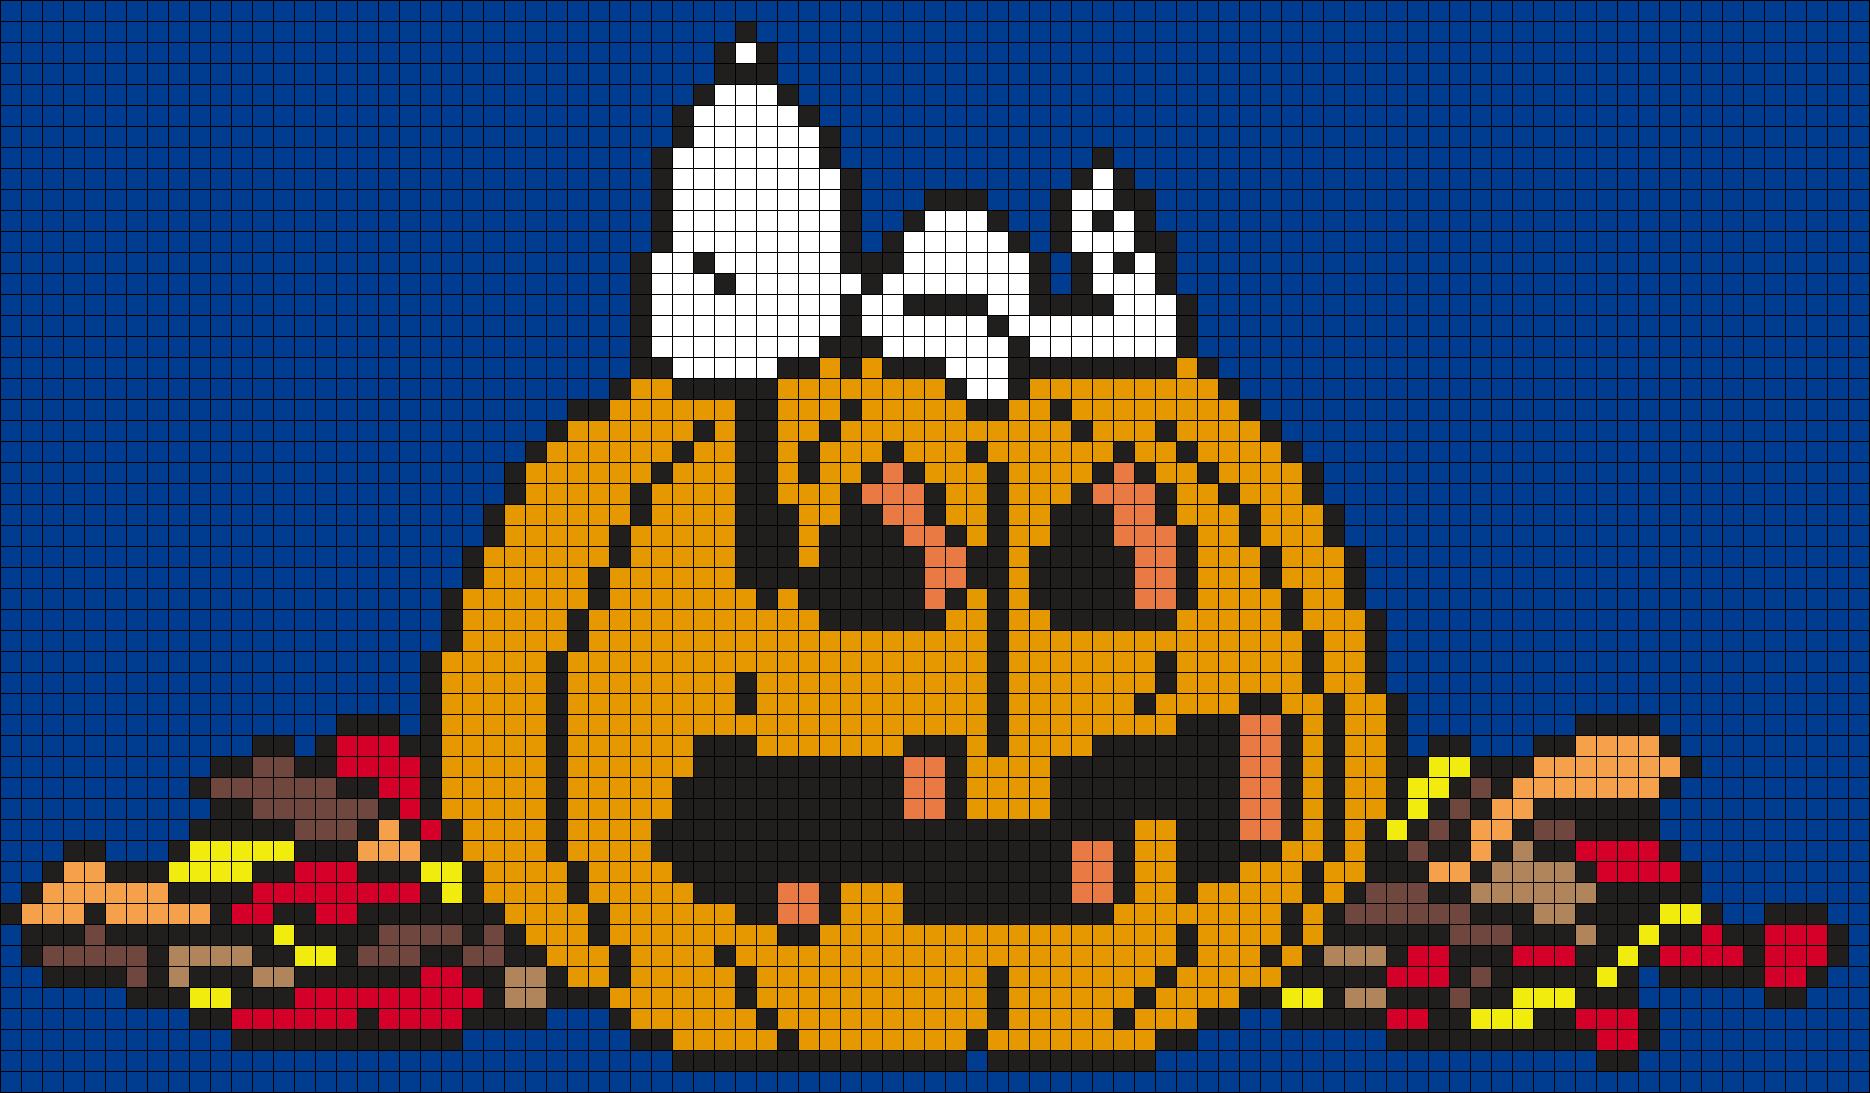 Halloween Snoopy On A Jack O'Lantern